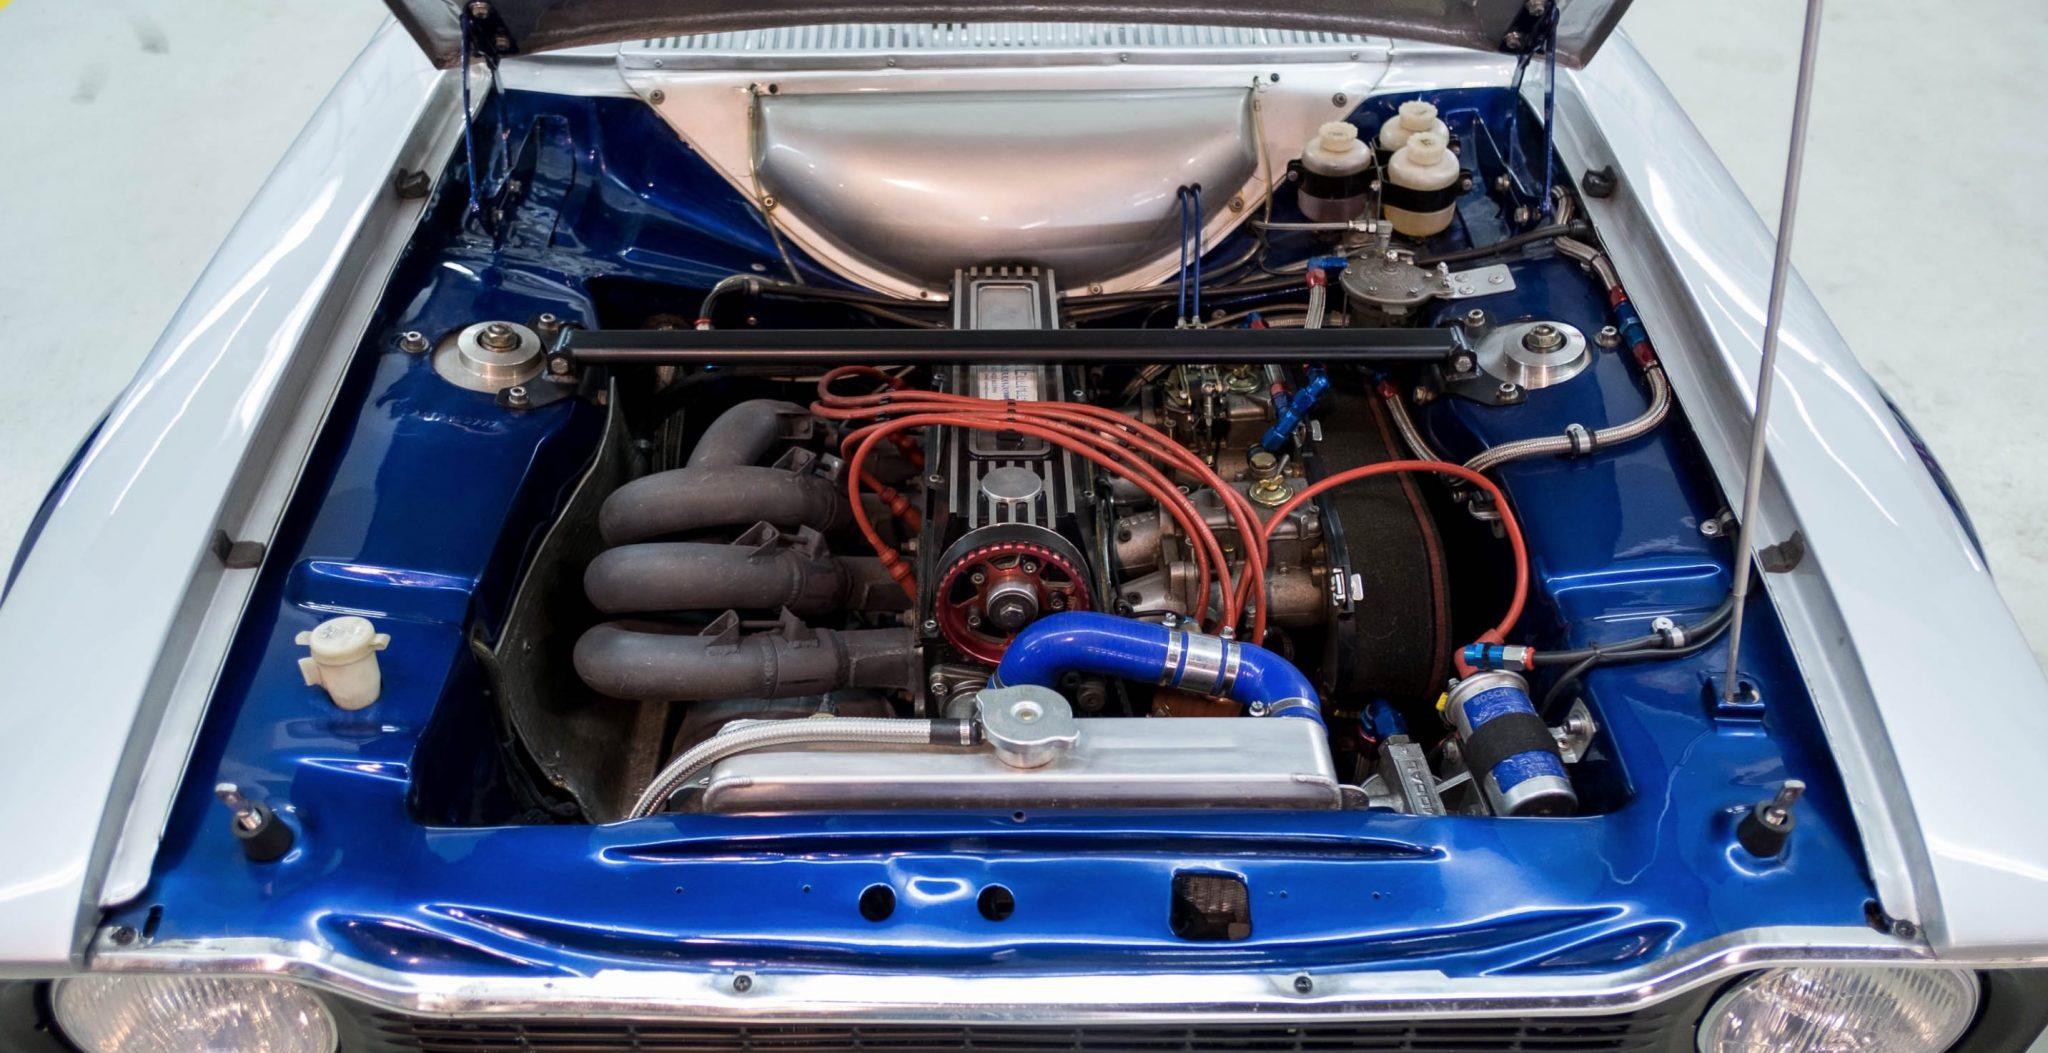 Ford escort racing engine